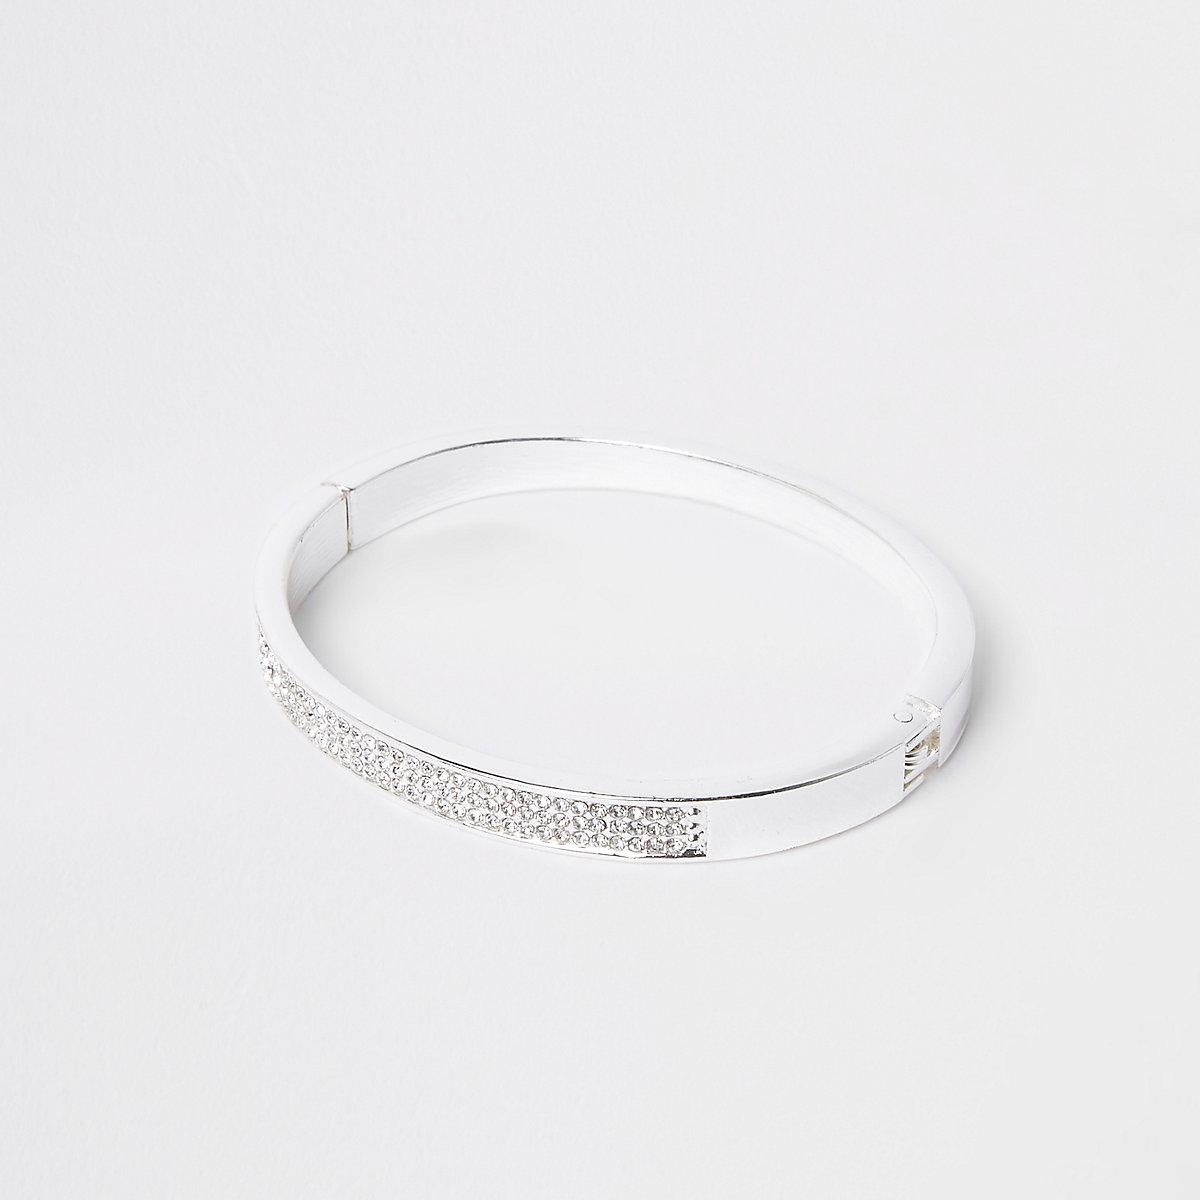 Silver diamante cuff bracelet